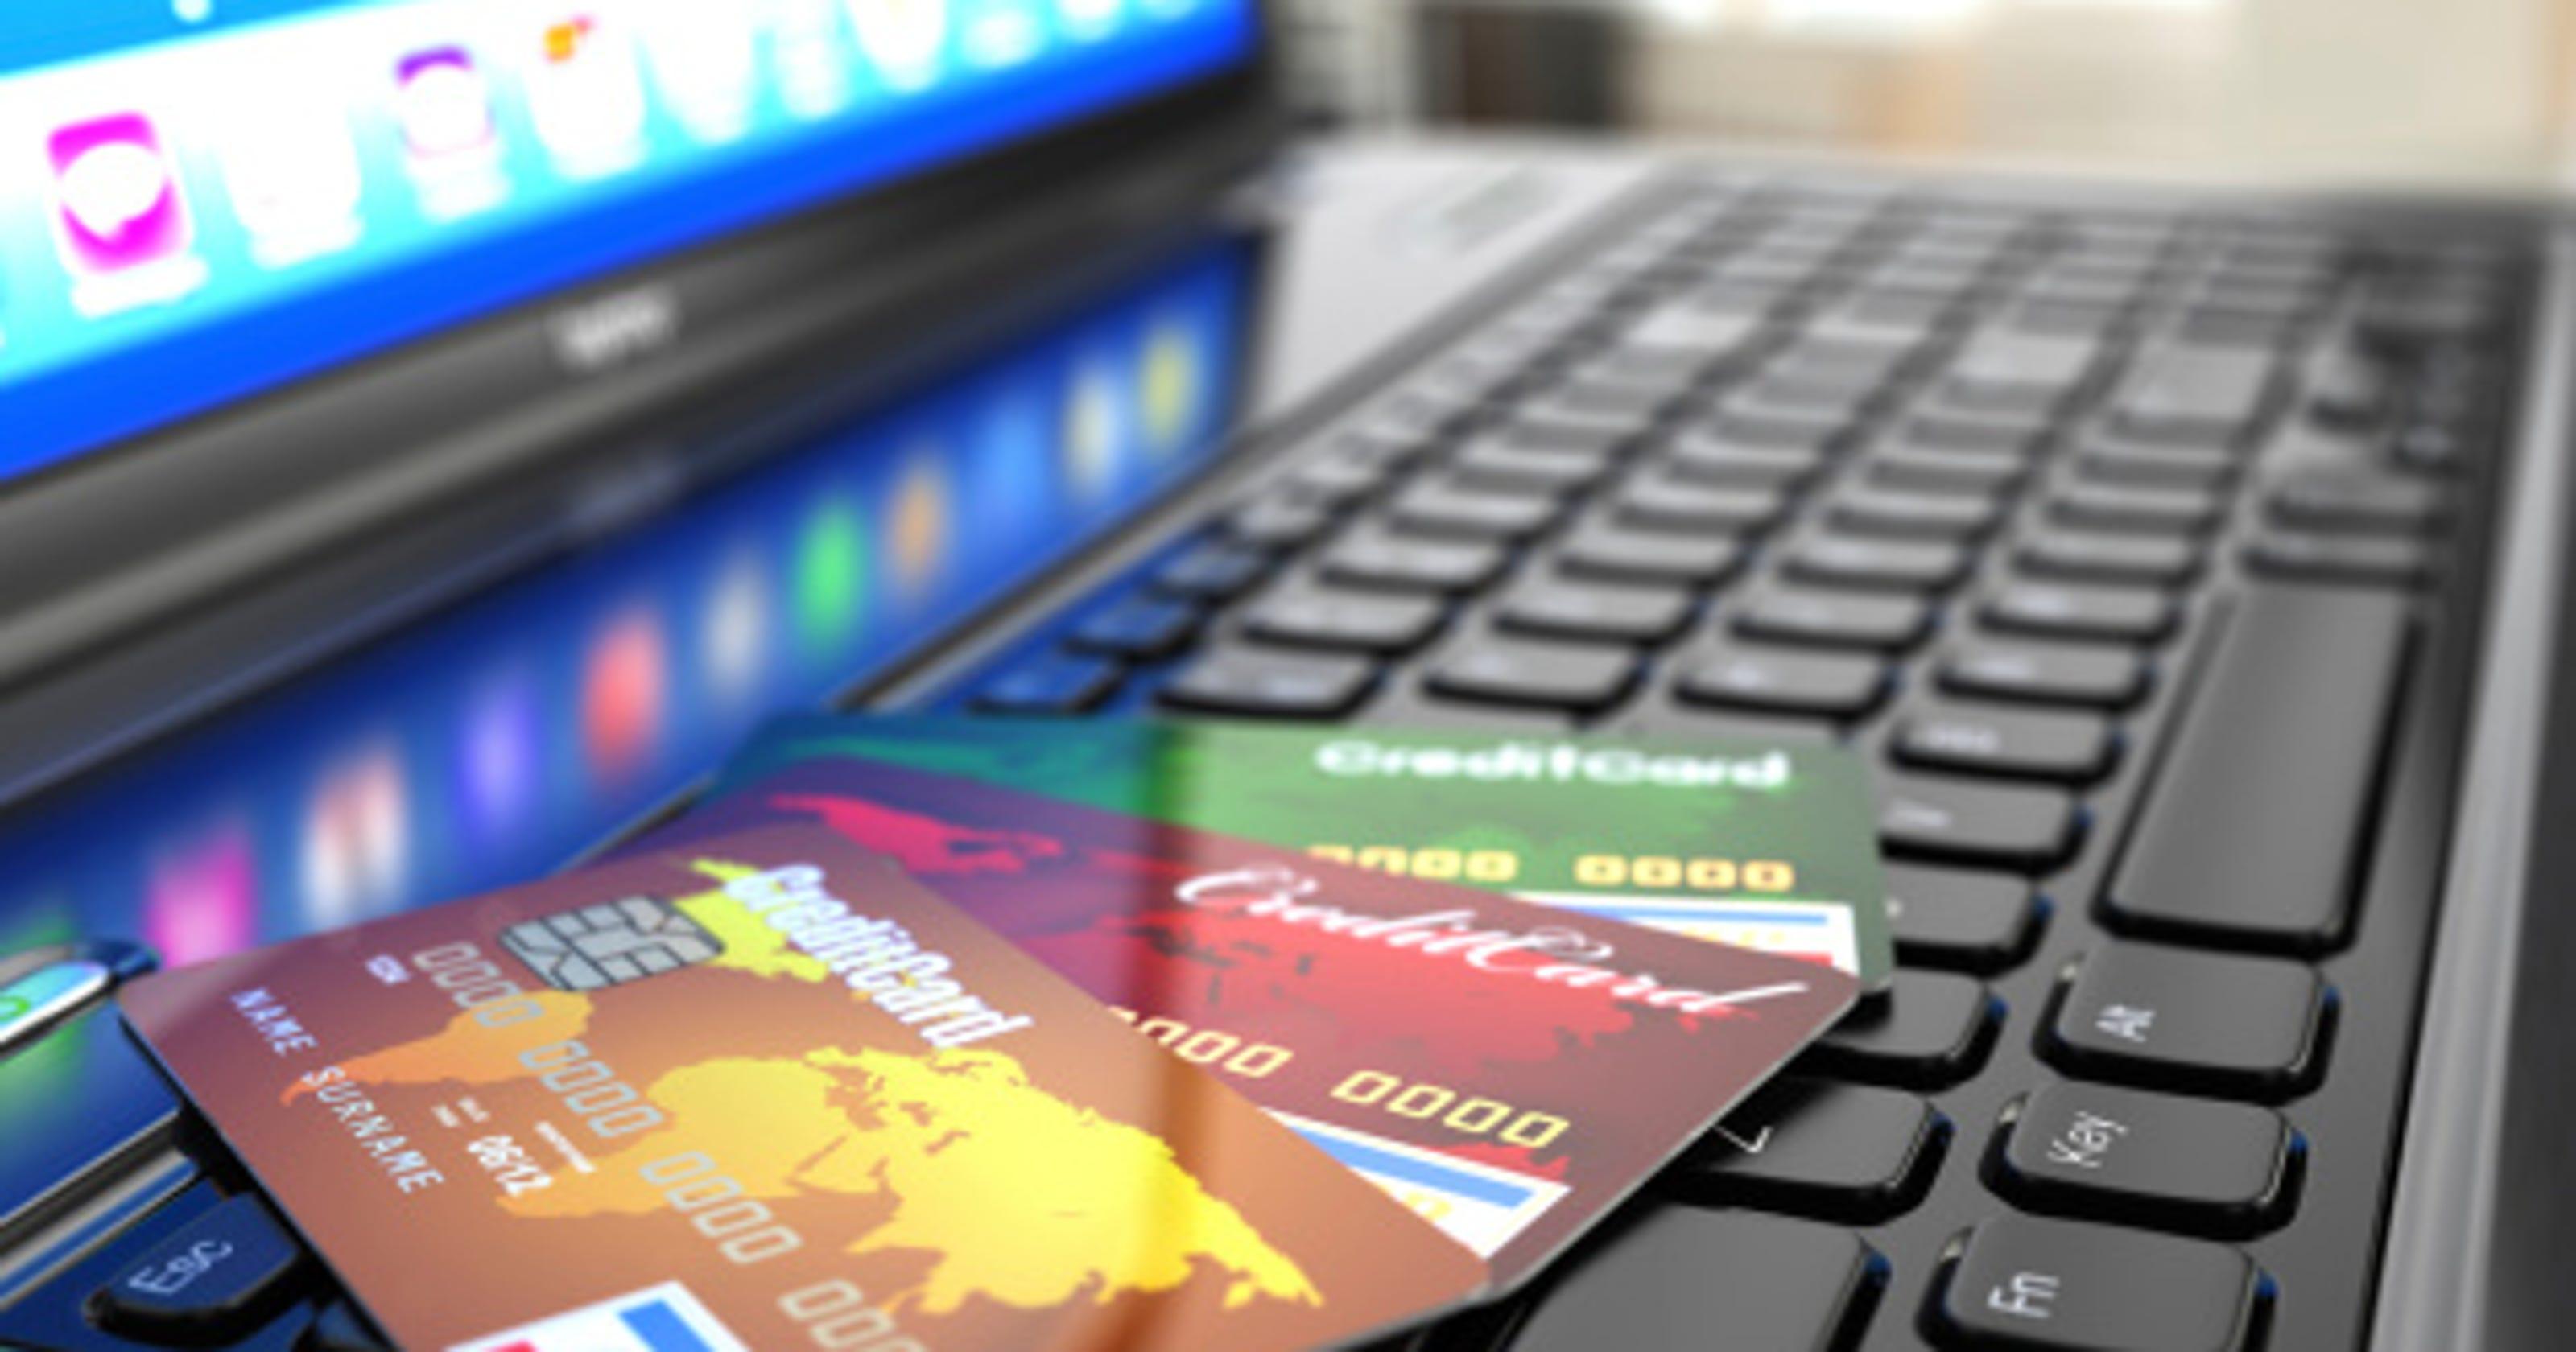 Buying stolen goods online has consequences